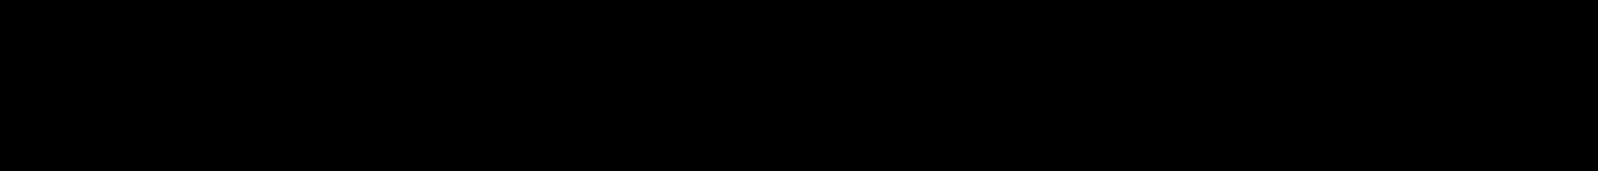 Psp Fonts Fontspace